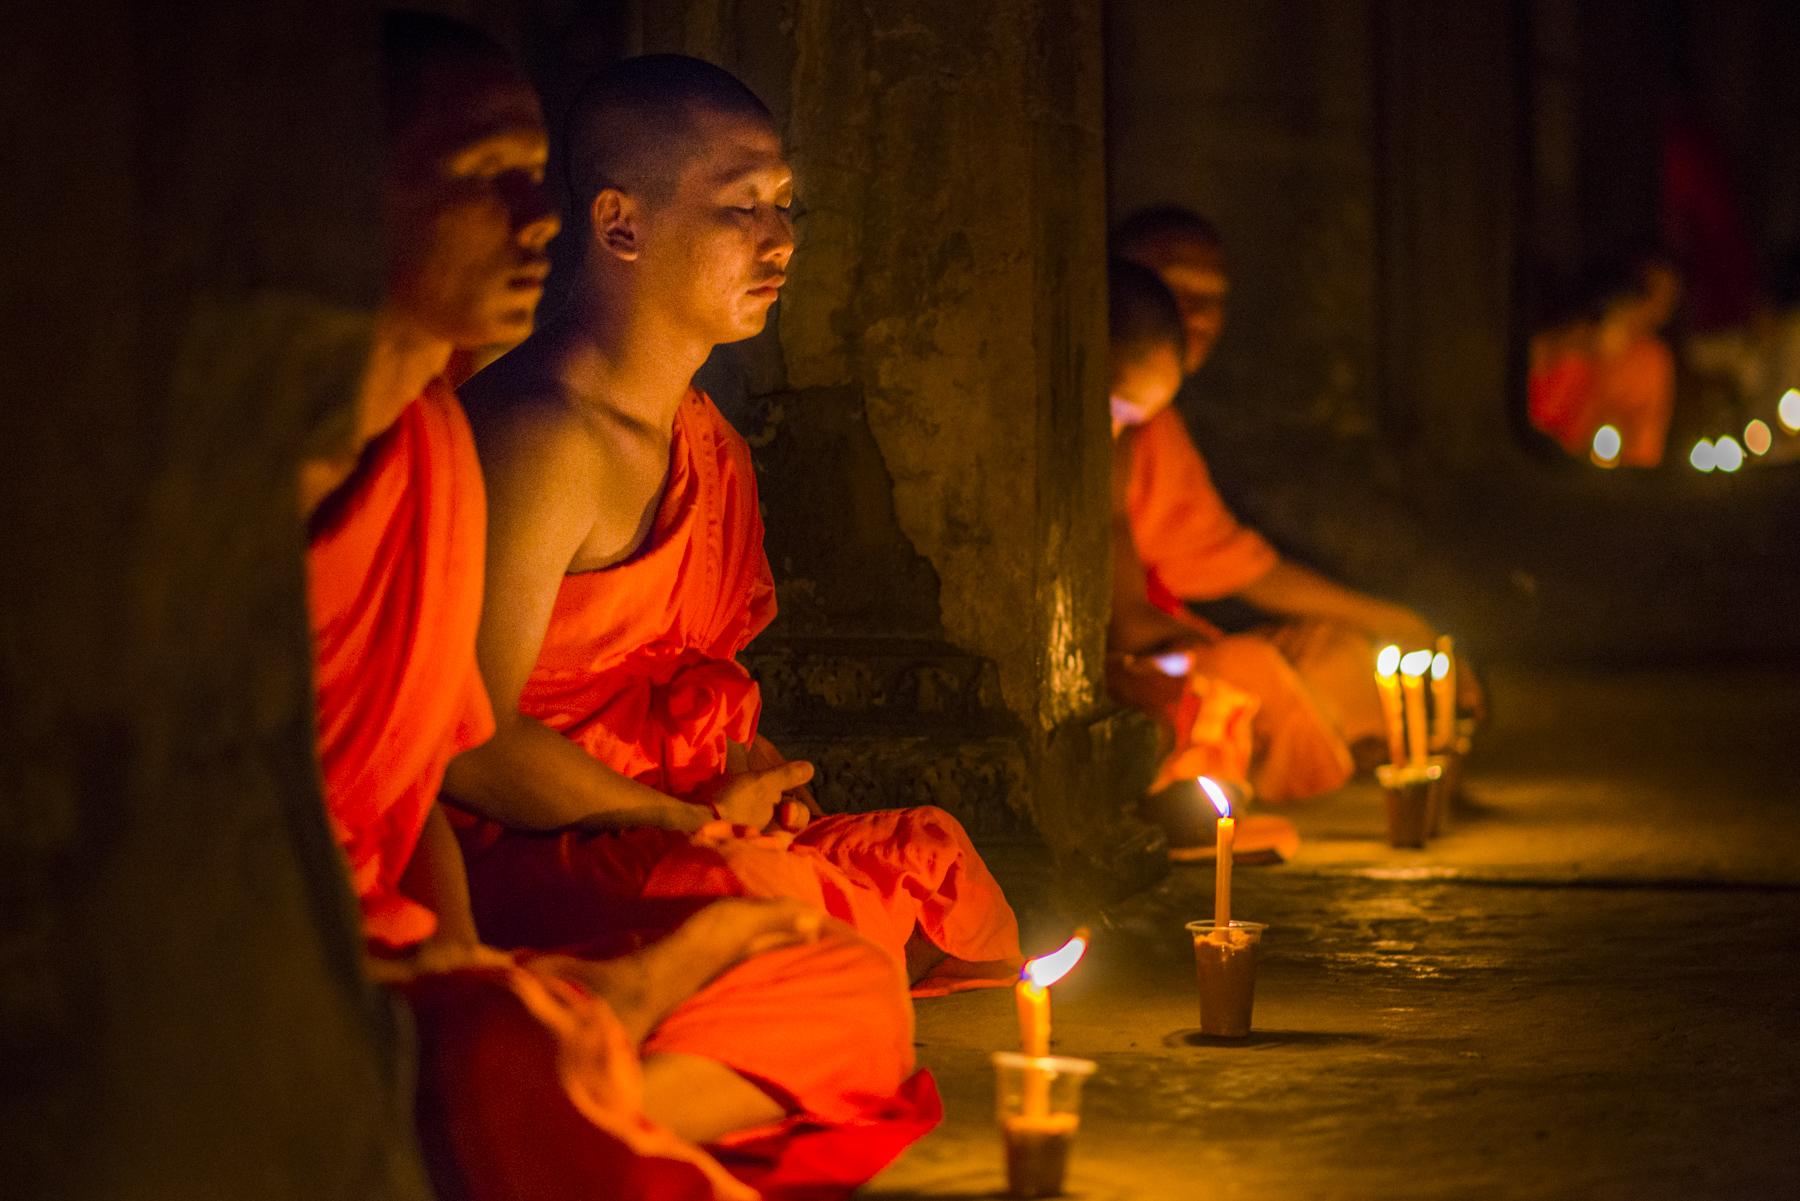 2016-05-20 Visek Bochea@Angkor Wat-0147.jpg